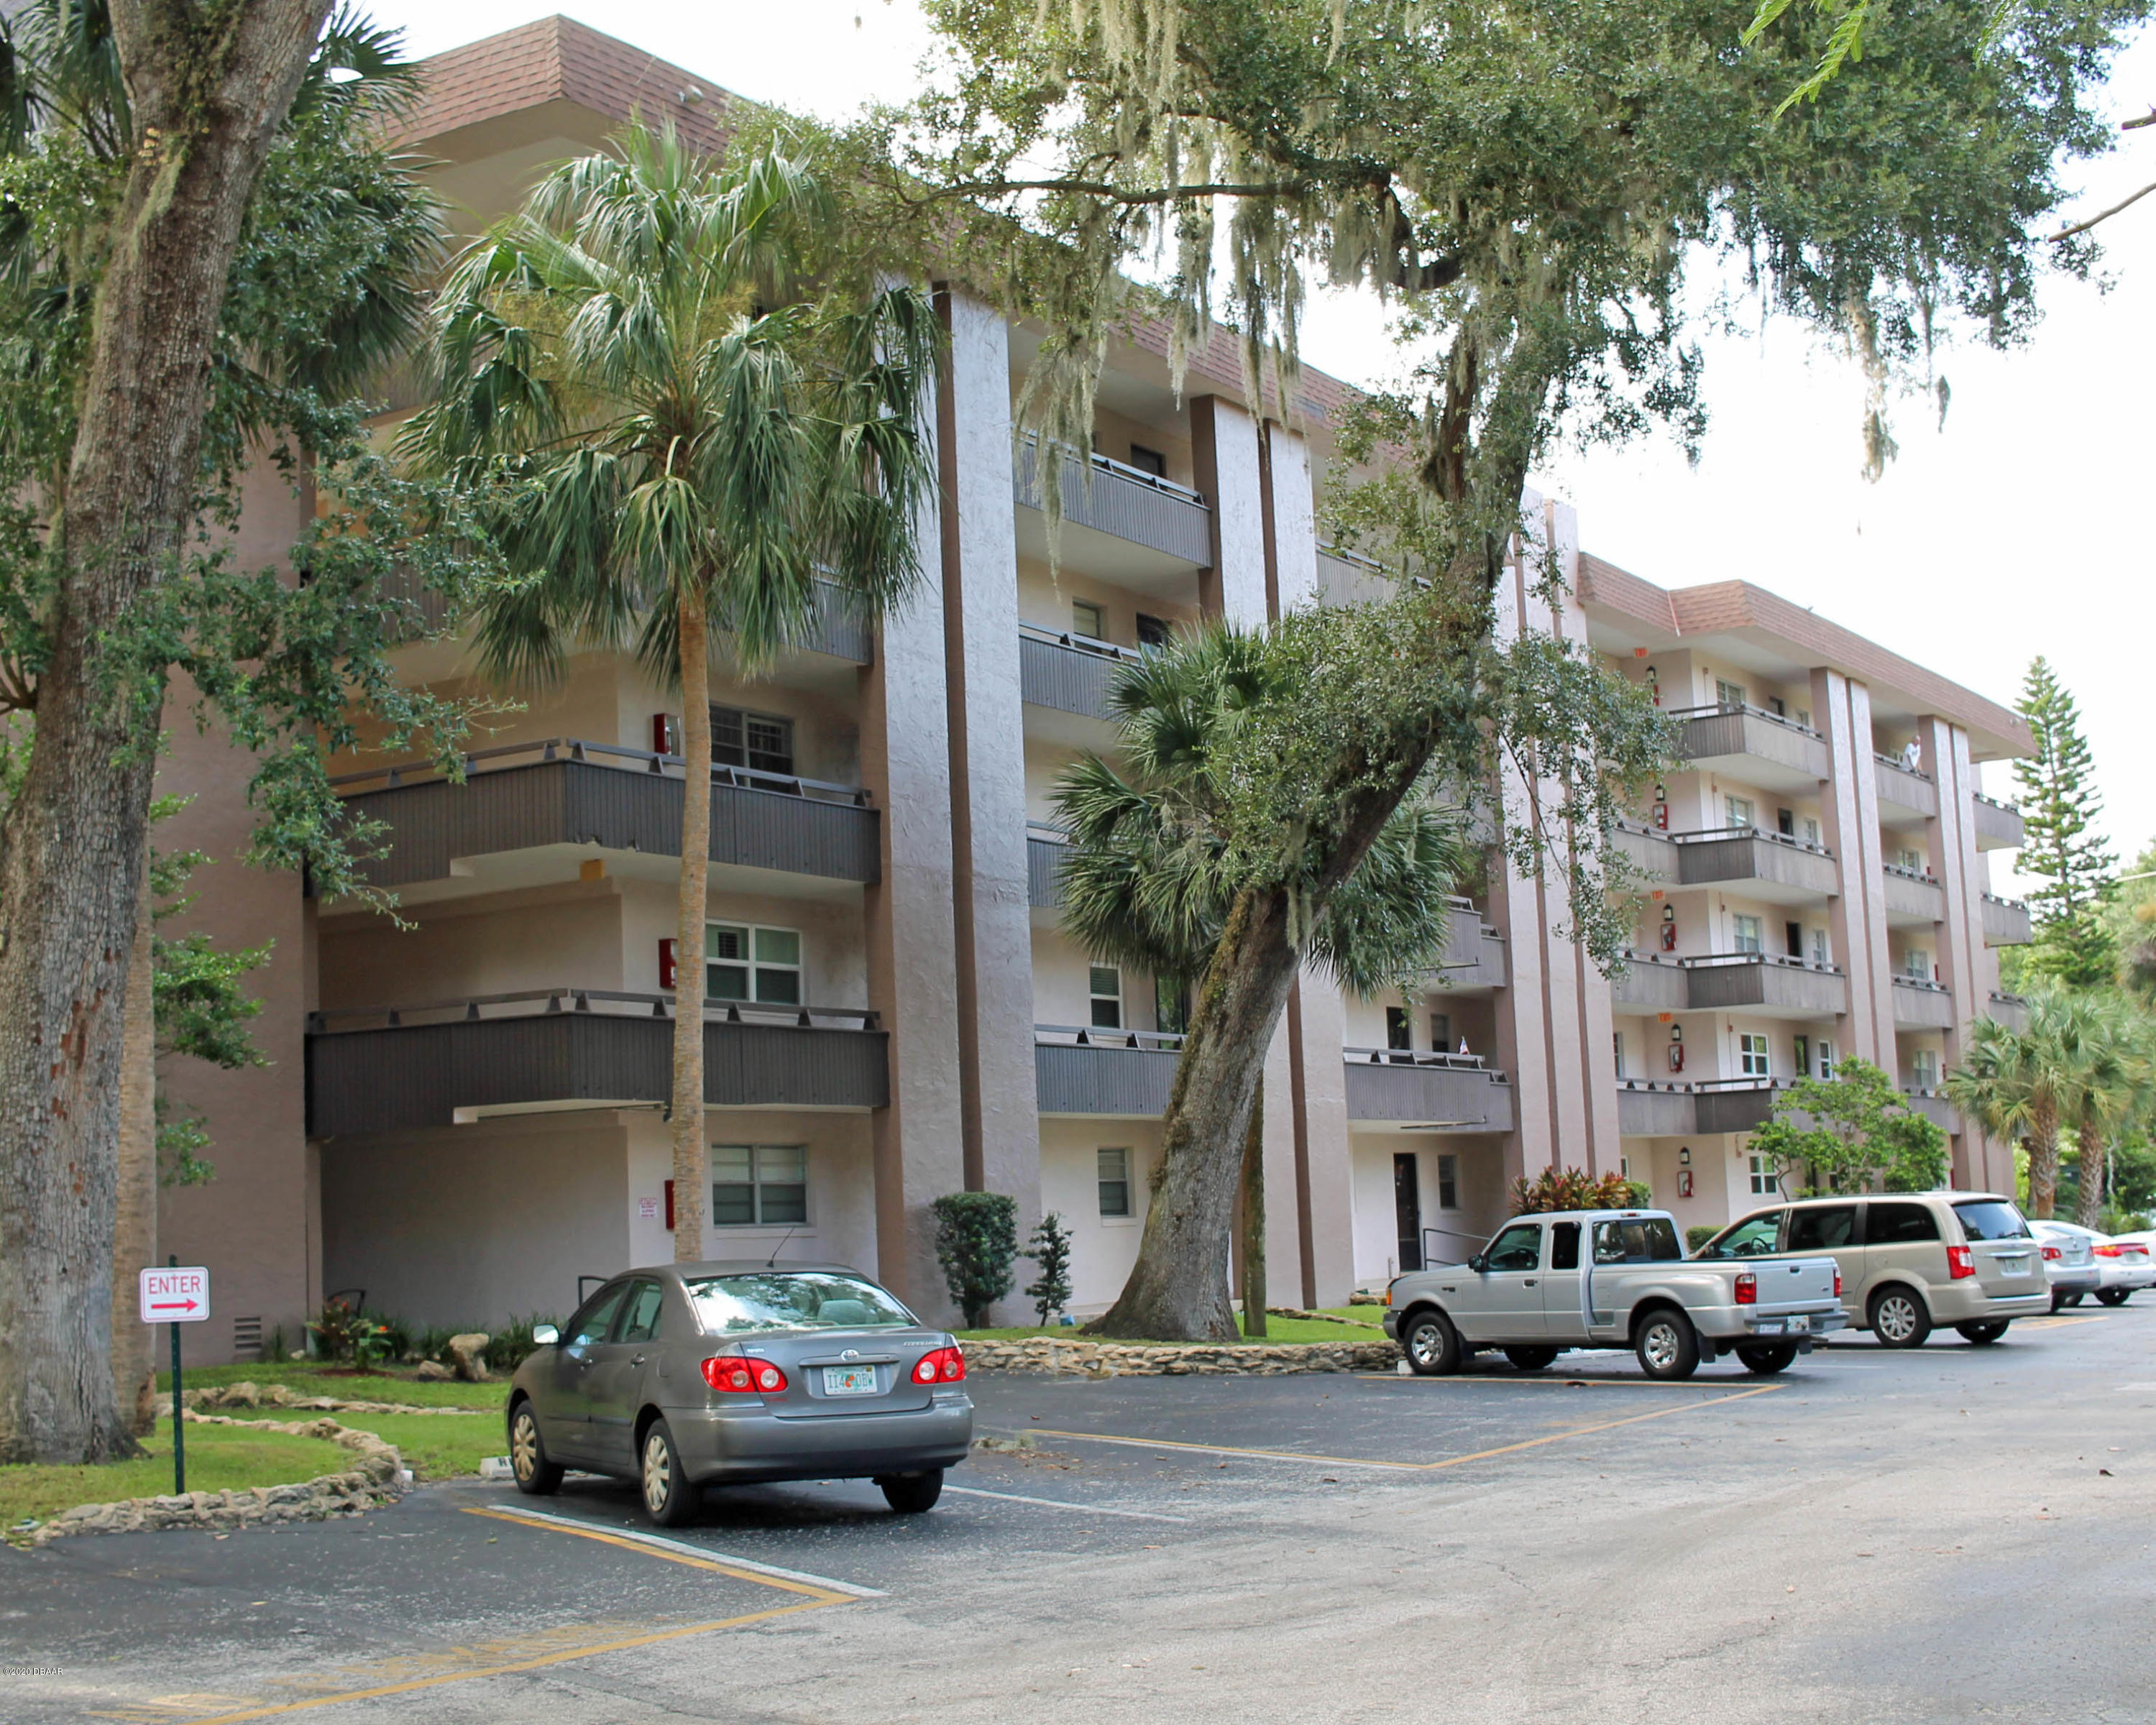 Photo of 640 N Nova Road #5110, Ormond Beach, FL 32174